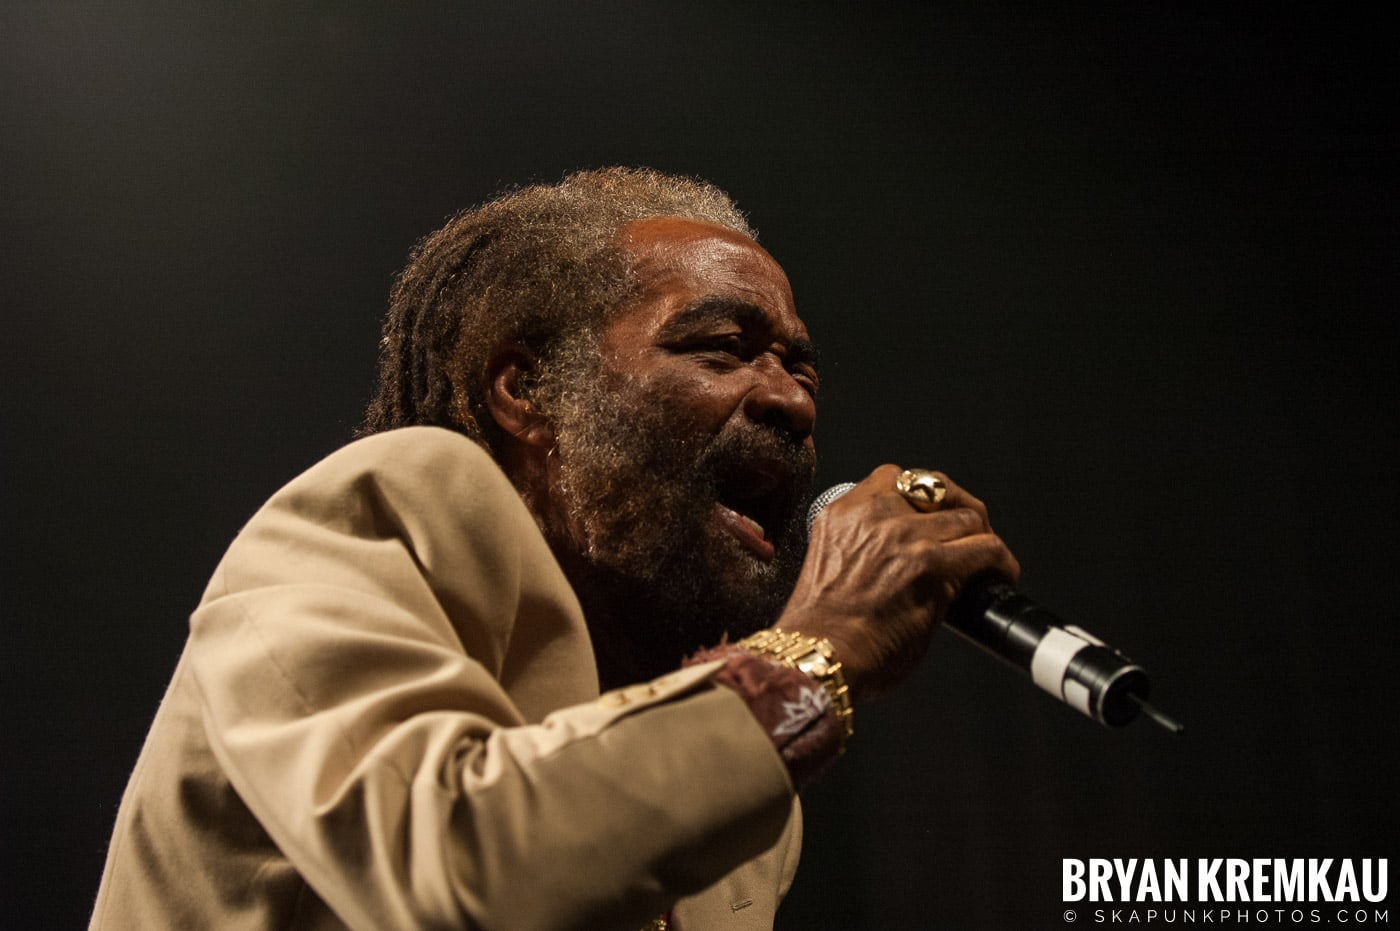 John Holt @ Vintage Reggae Fest - Hammerstein Ballroom, NYC - 12.16.07 (5)